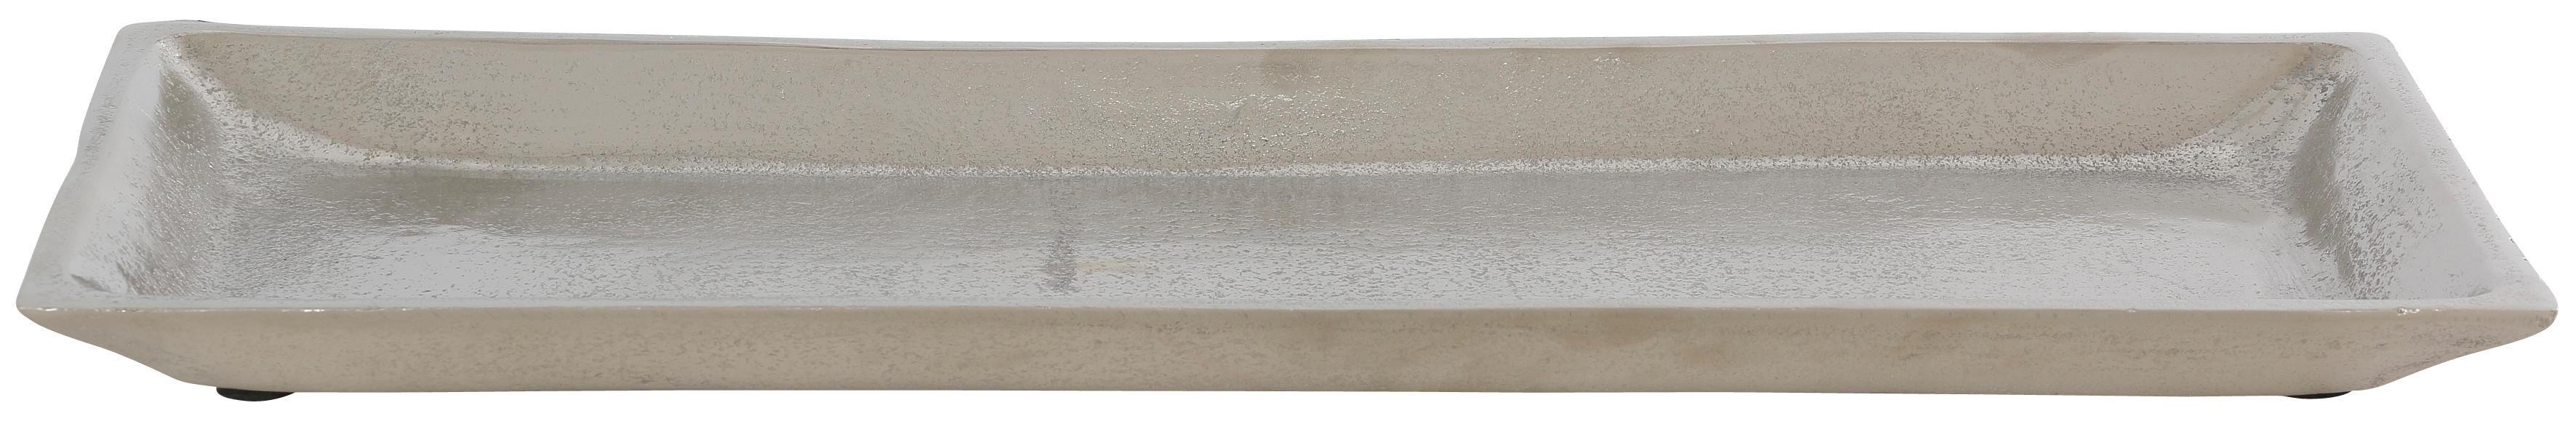 Dekoschale, aus Aluminium silberfarben Dekoschale Dekoschalen Dekotabletts Deko Wohnaccessoires